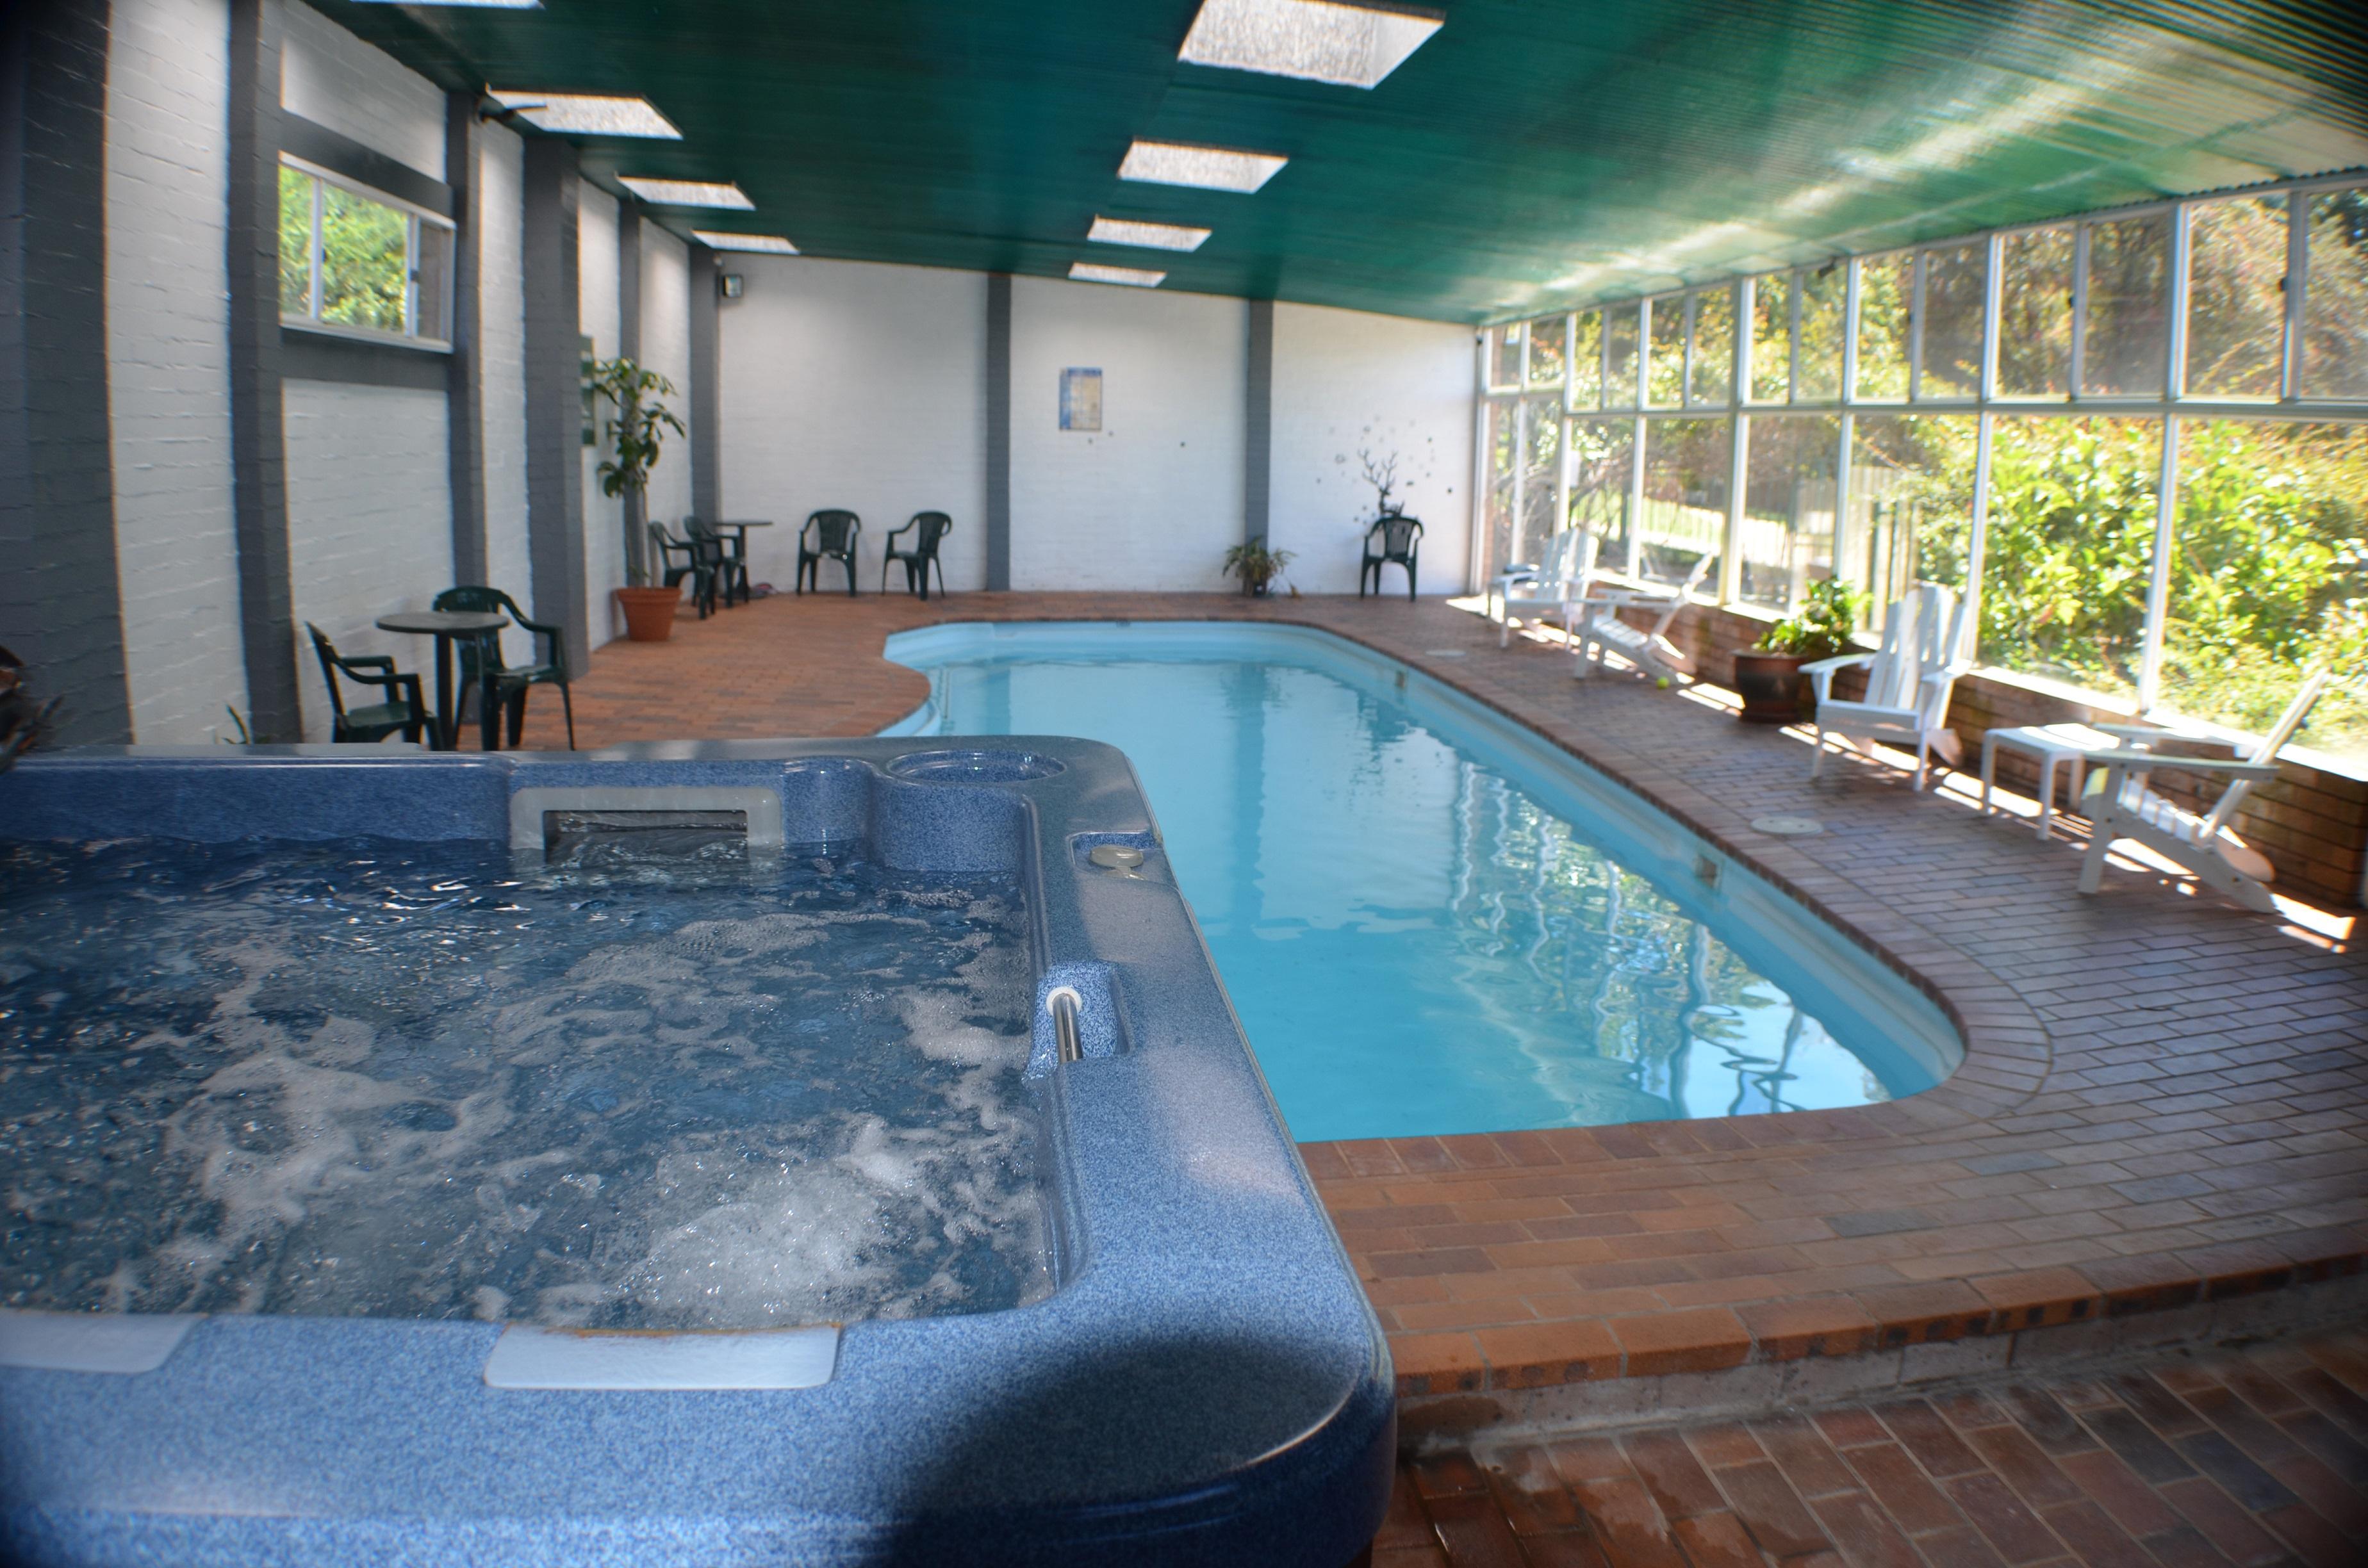 Heated indoor Pool & Spa gallery image